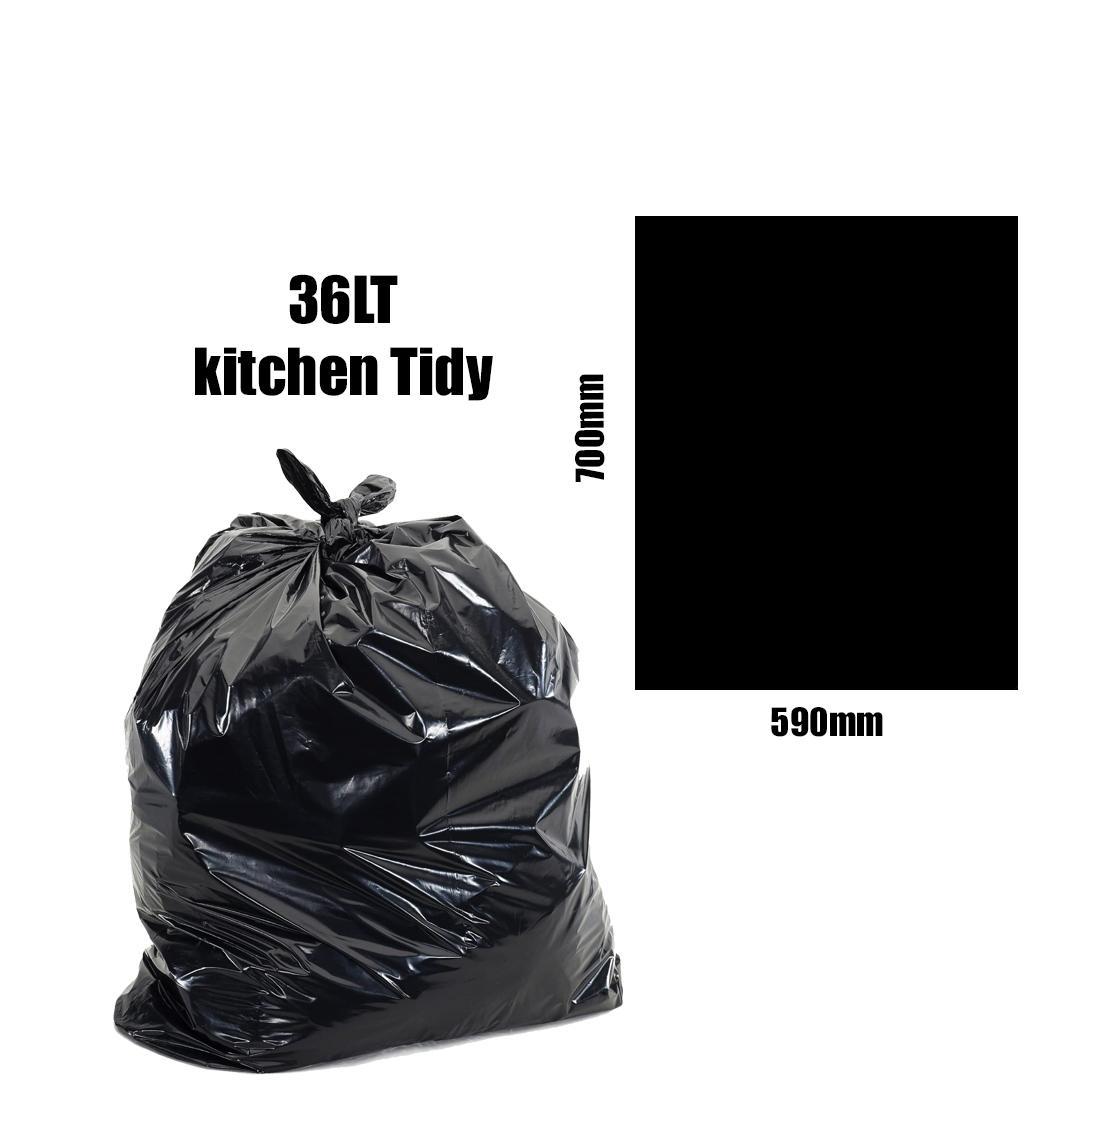 Kitchen Tidy Liners 36lt Black Carton 1000pk